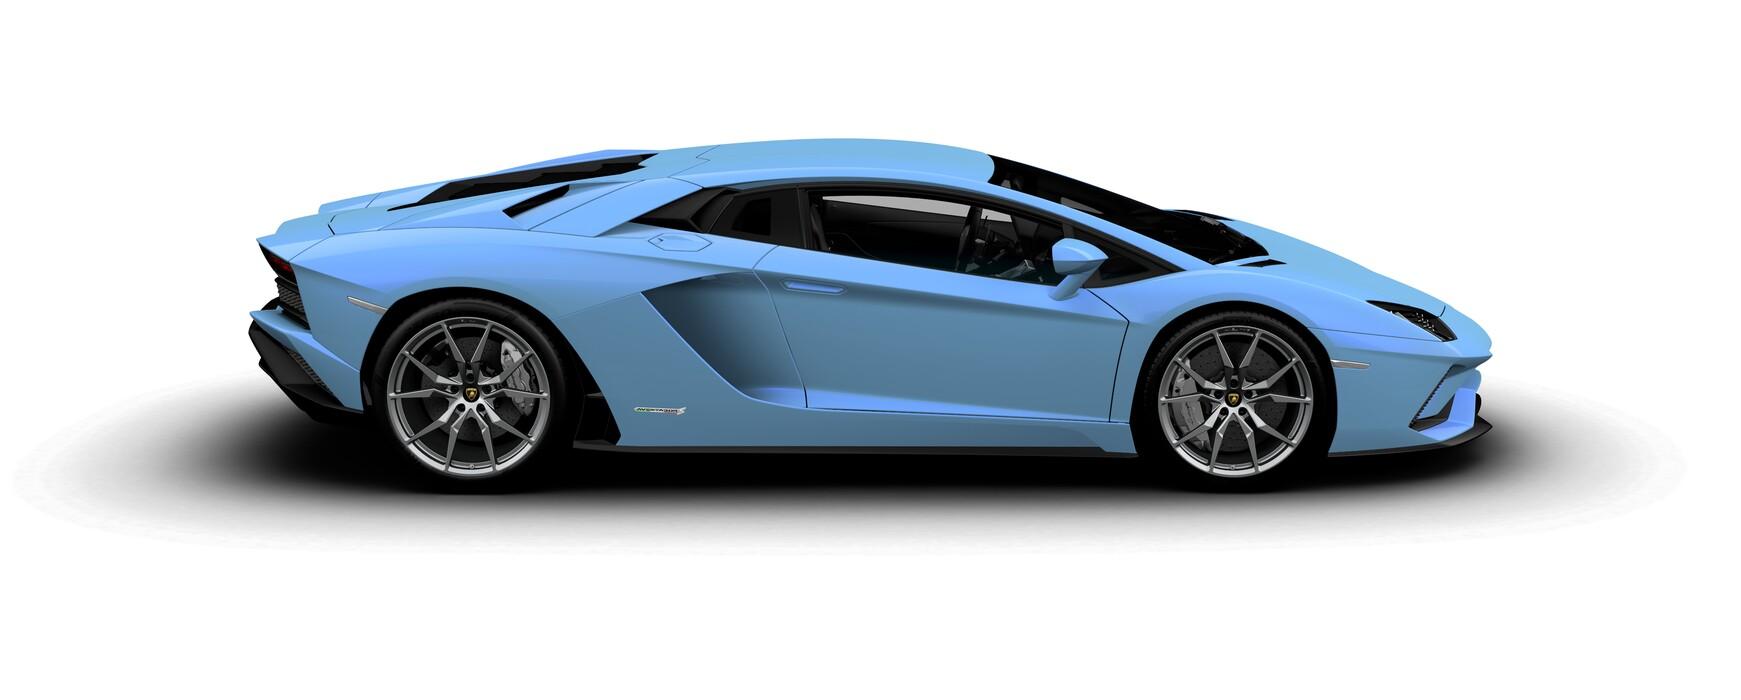 Lamborghini Aventador S Coupe pearl Blu Cepheus side view